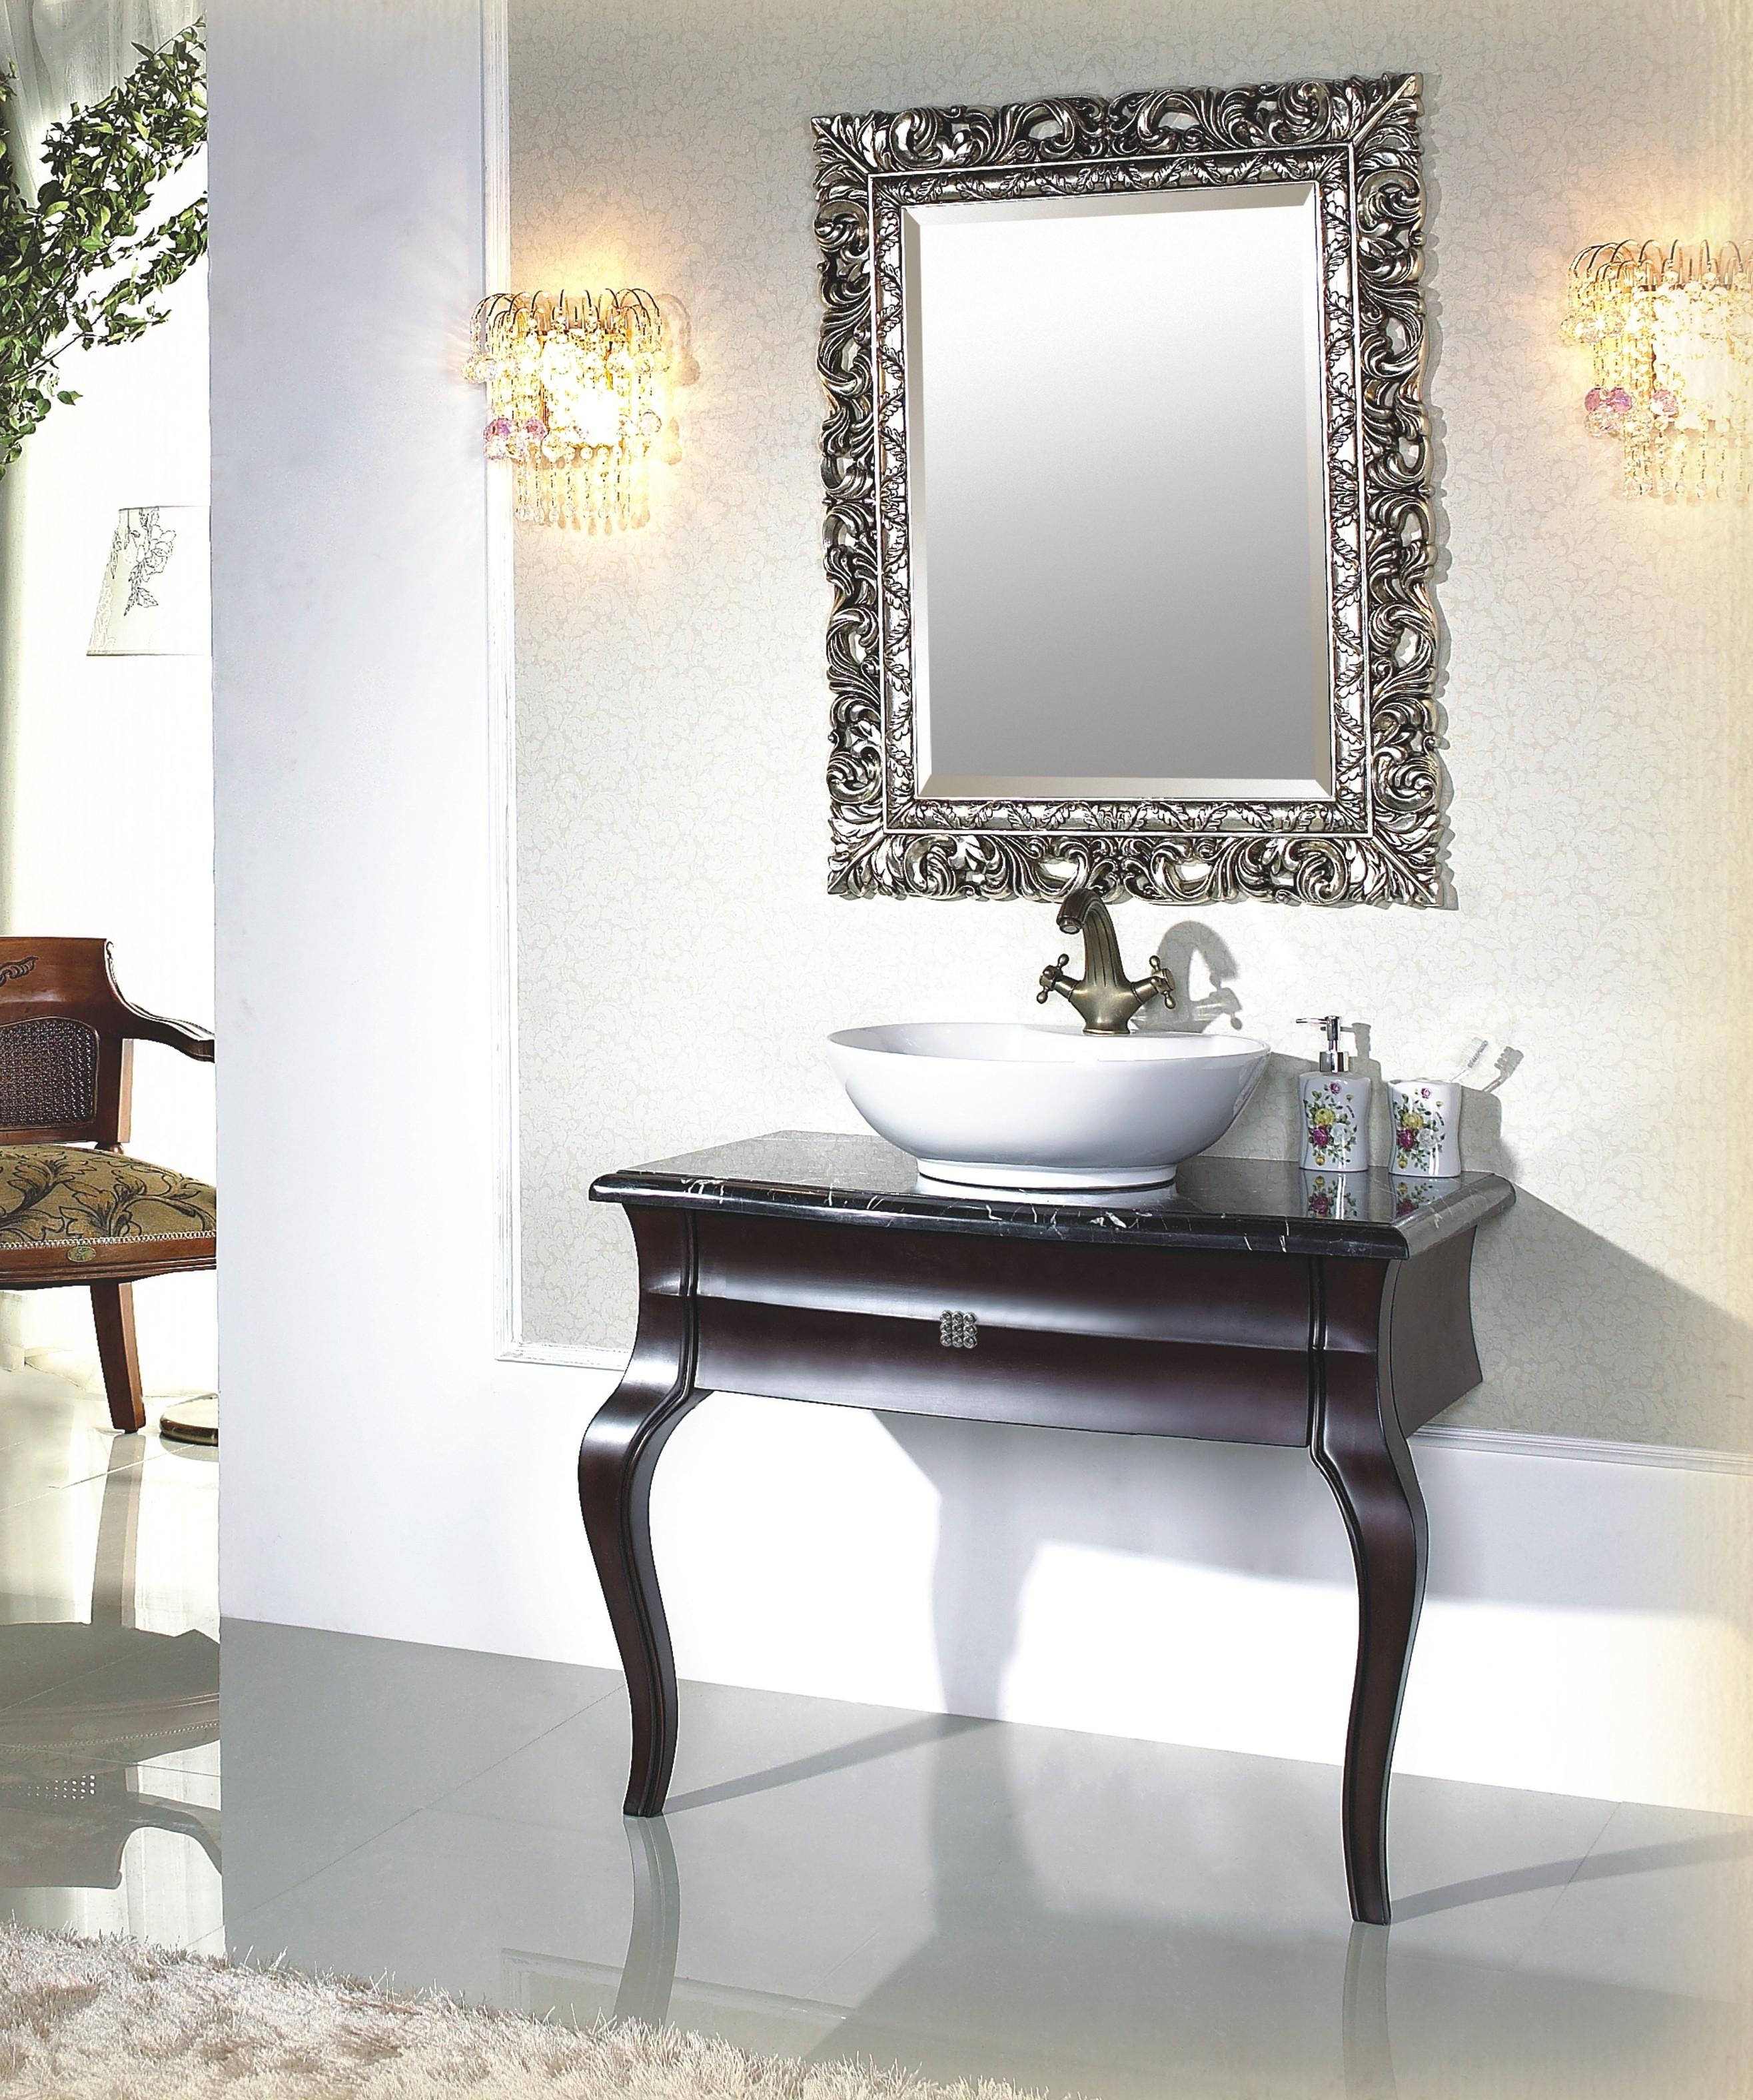 Vintage Bathroom Mirrors Creative Bathroom Decoration In Antique Bathroom Mirrors (View 3 of 15)